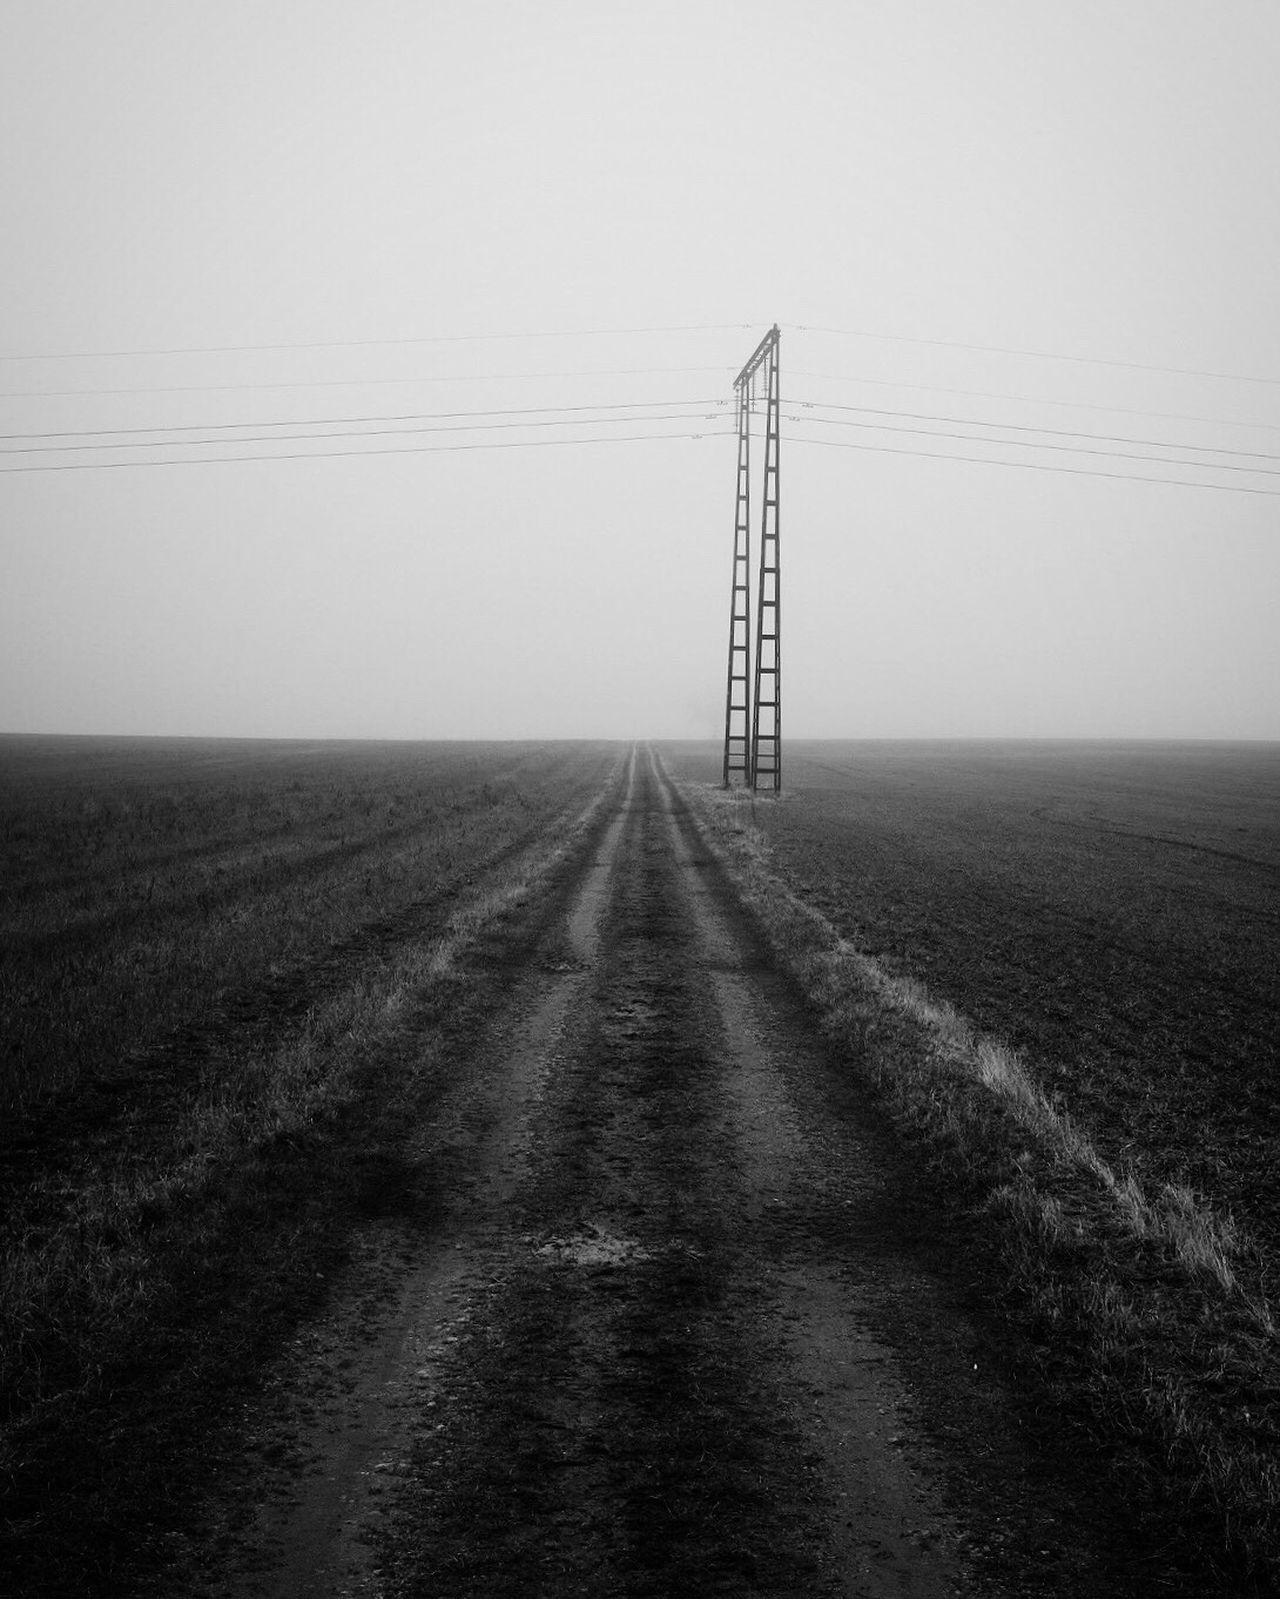 Field Landscape Tranquility Electricity Pylon Winter Shootermag Monochrome Bw_collection EyeEm Best Shots - Black + White Vanishing Point